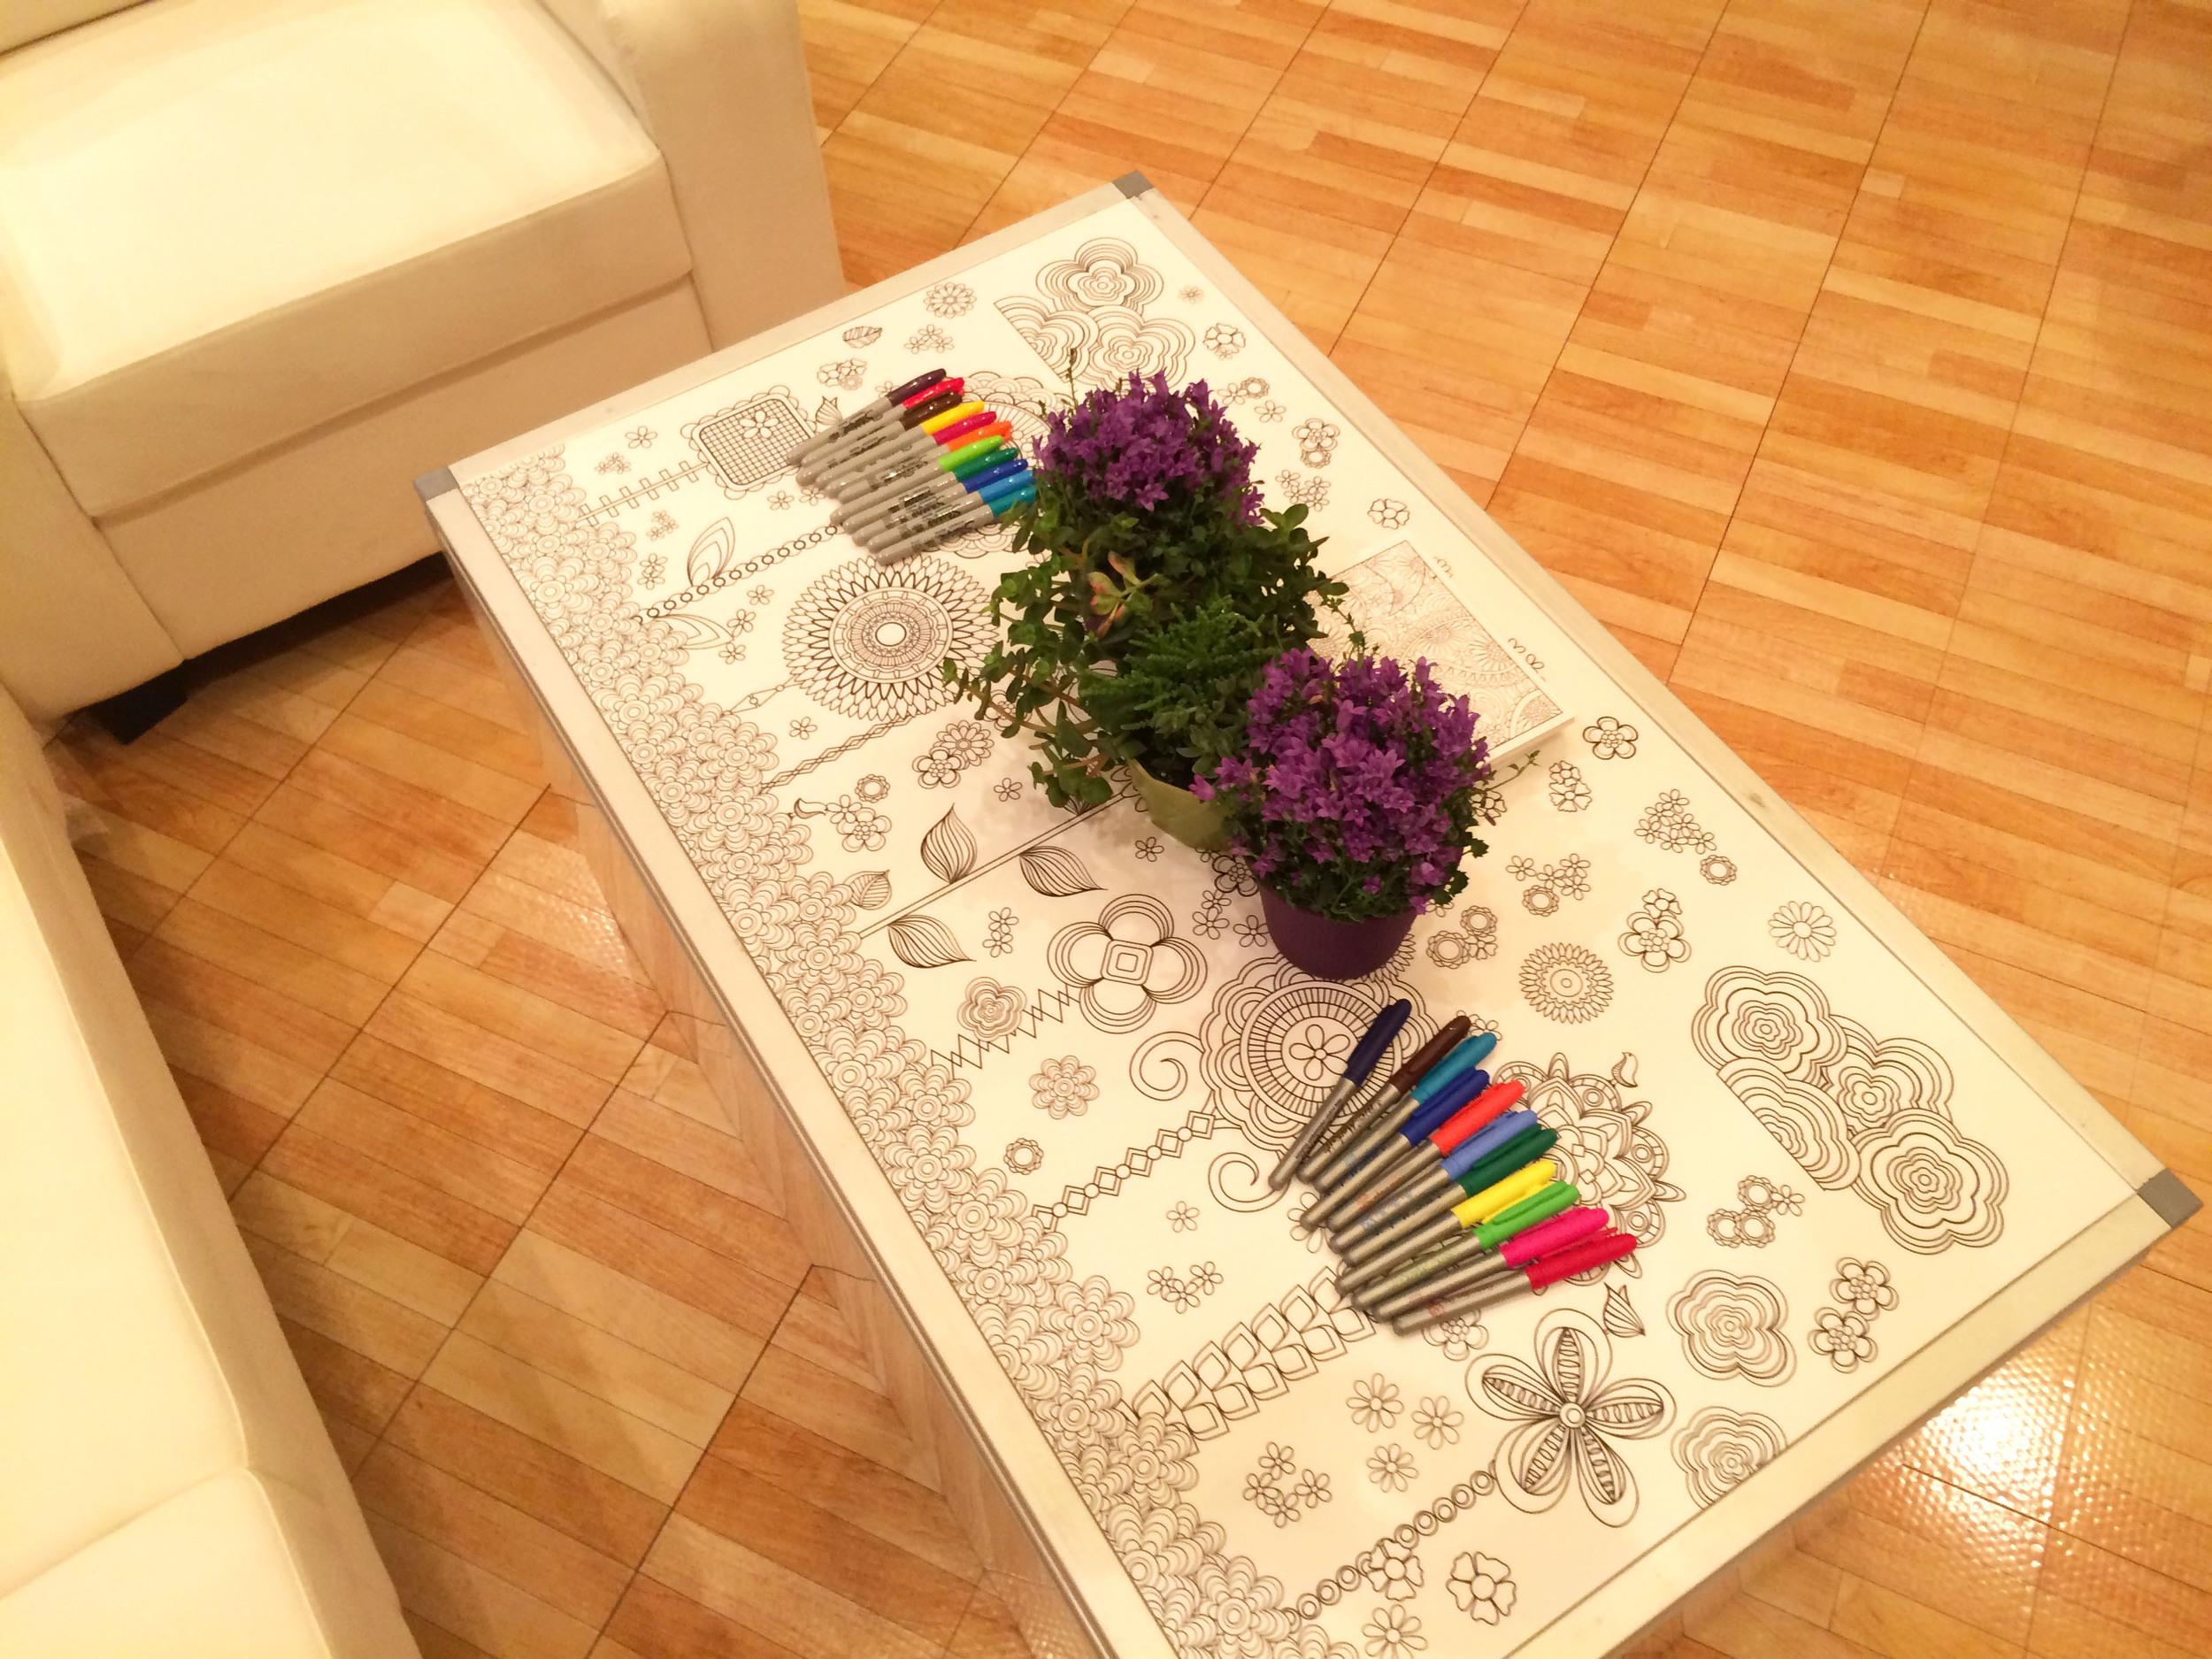 Alt Summer 2015 Squarespace Lounge featuring Artwork by Jenean Morrison.